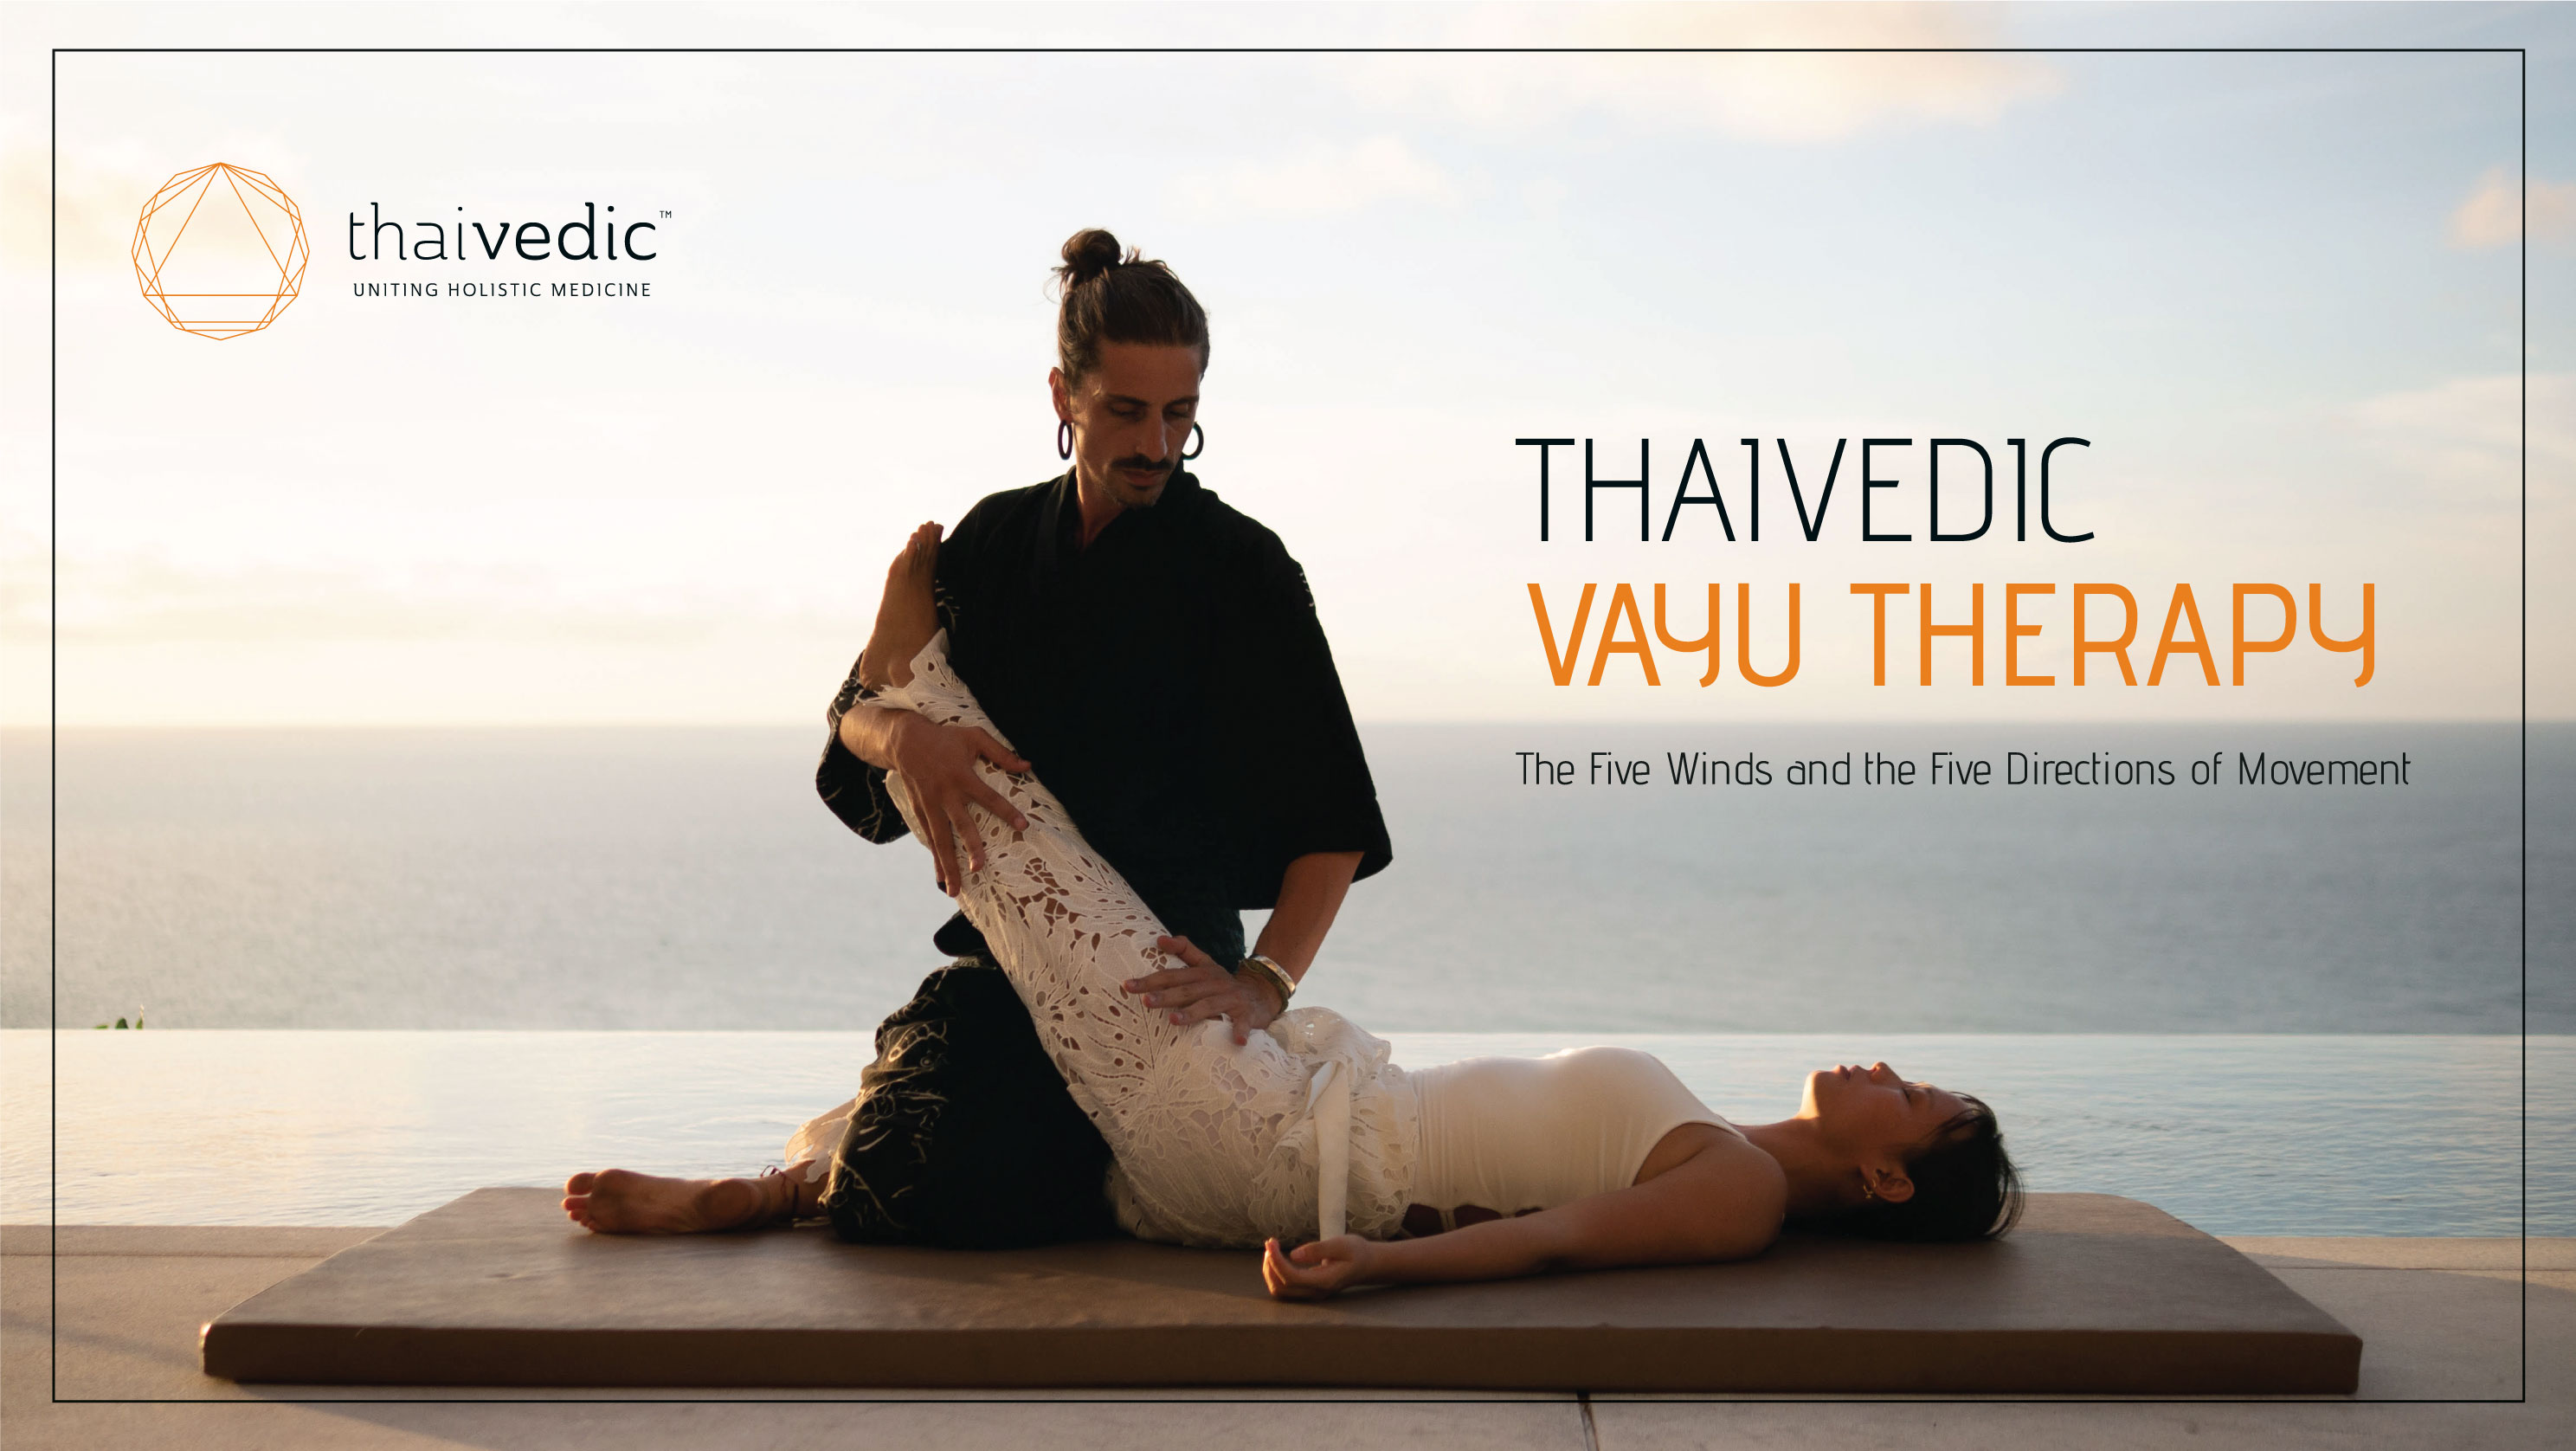 Thaimassage healing